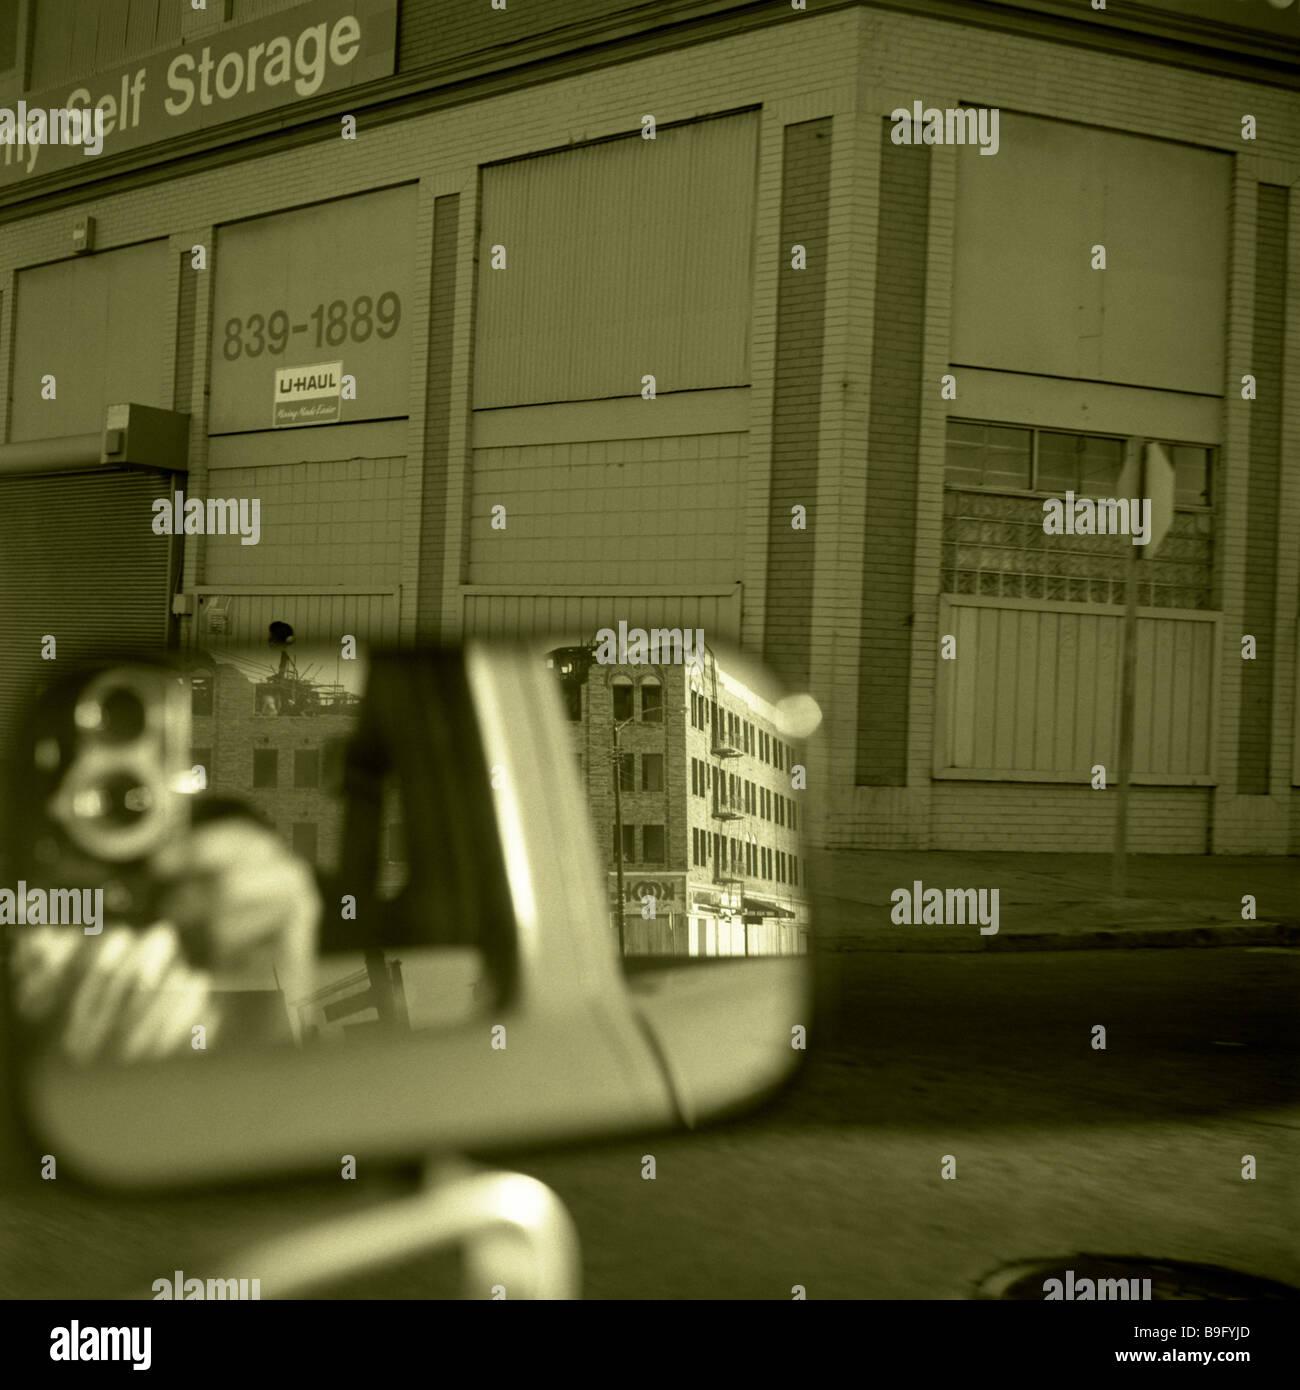 Resumen de Oakland California usa espejos retrovisores s/w Resumen América arquitectura coche americano focus Imagen De Stock